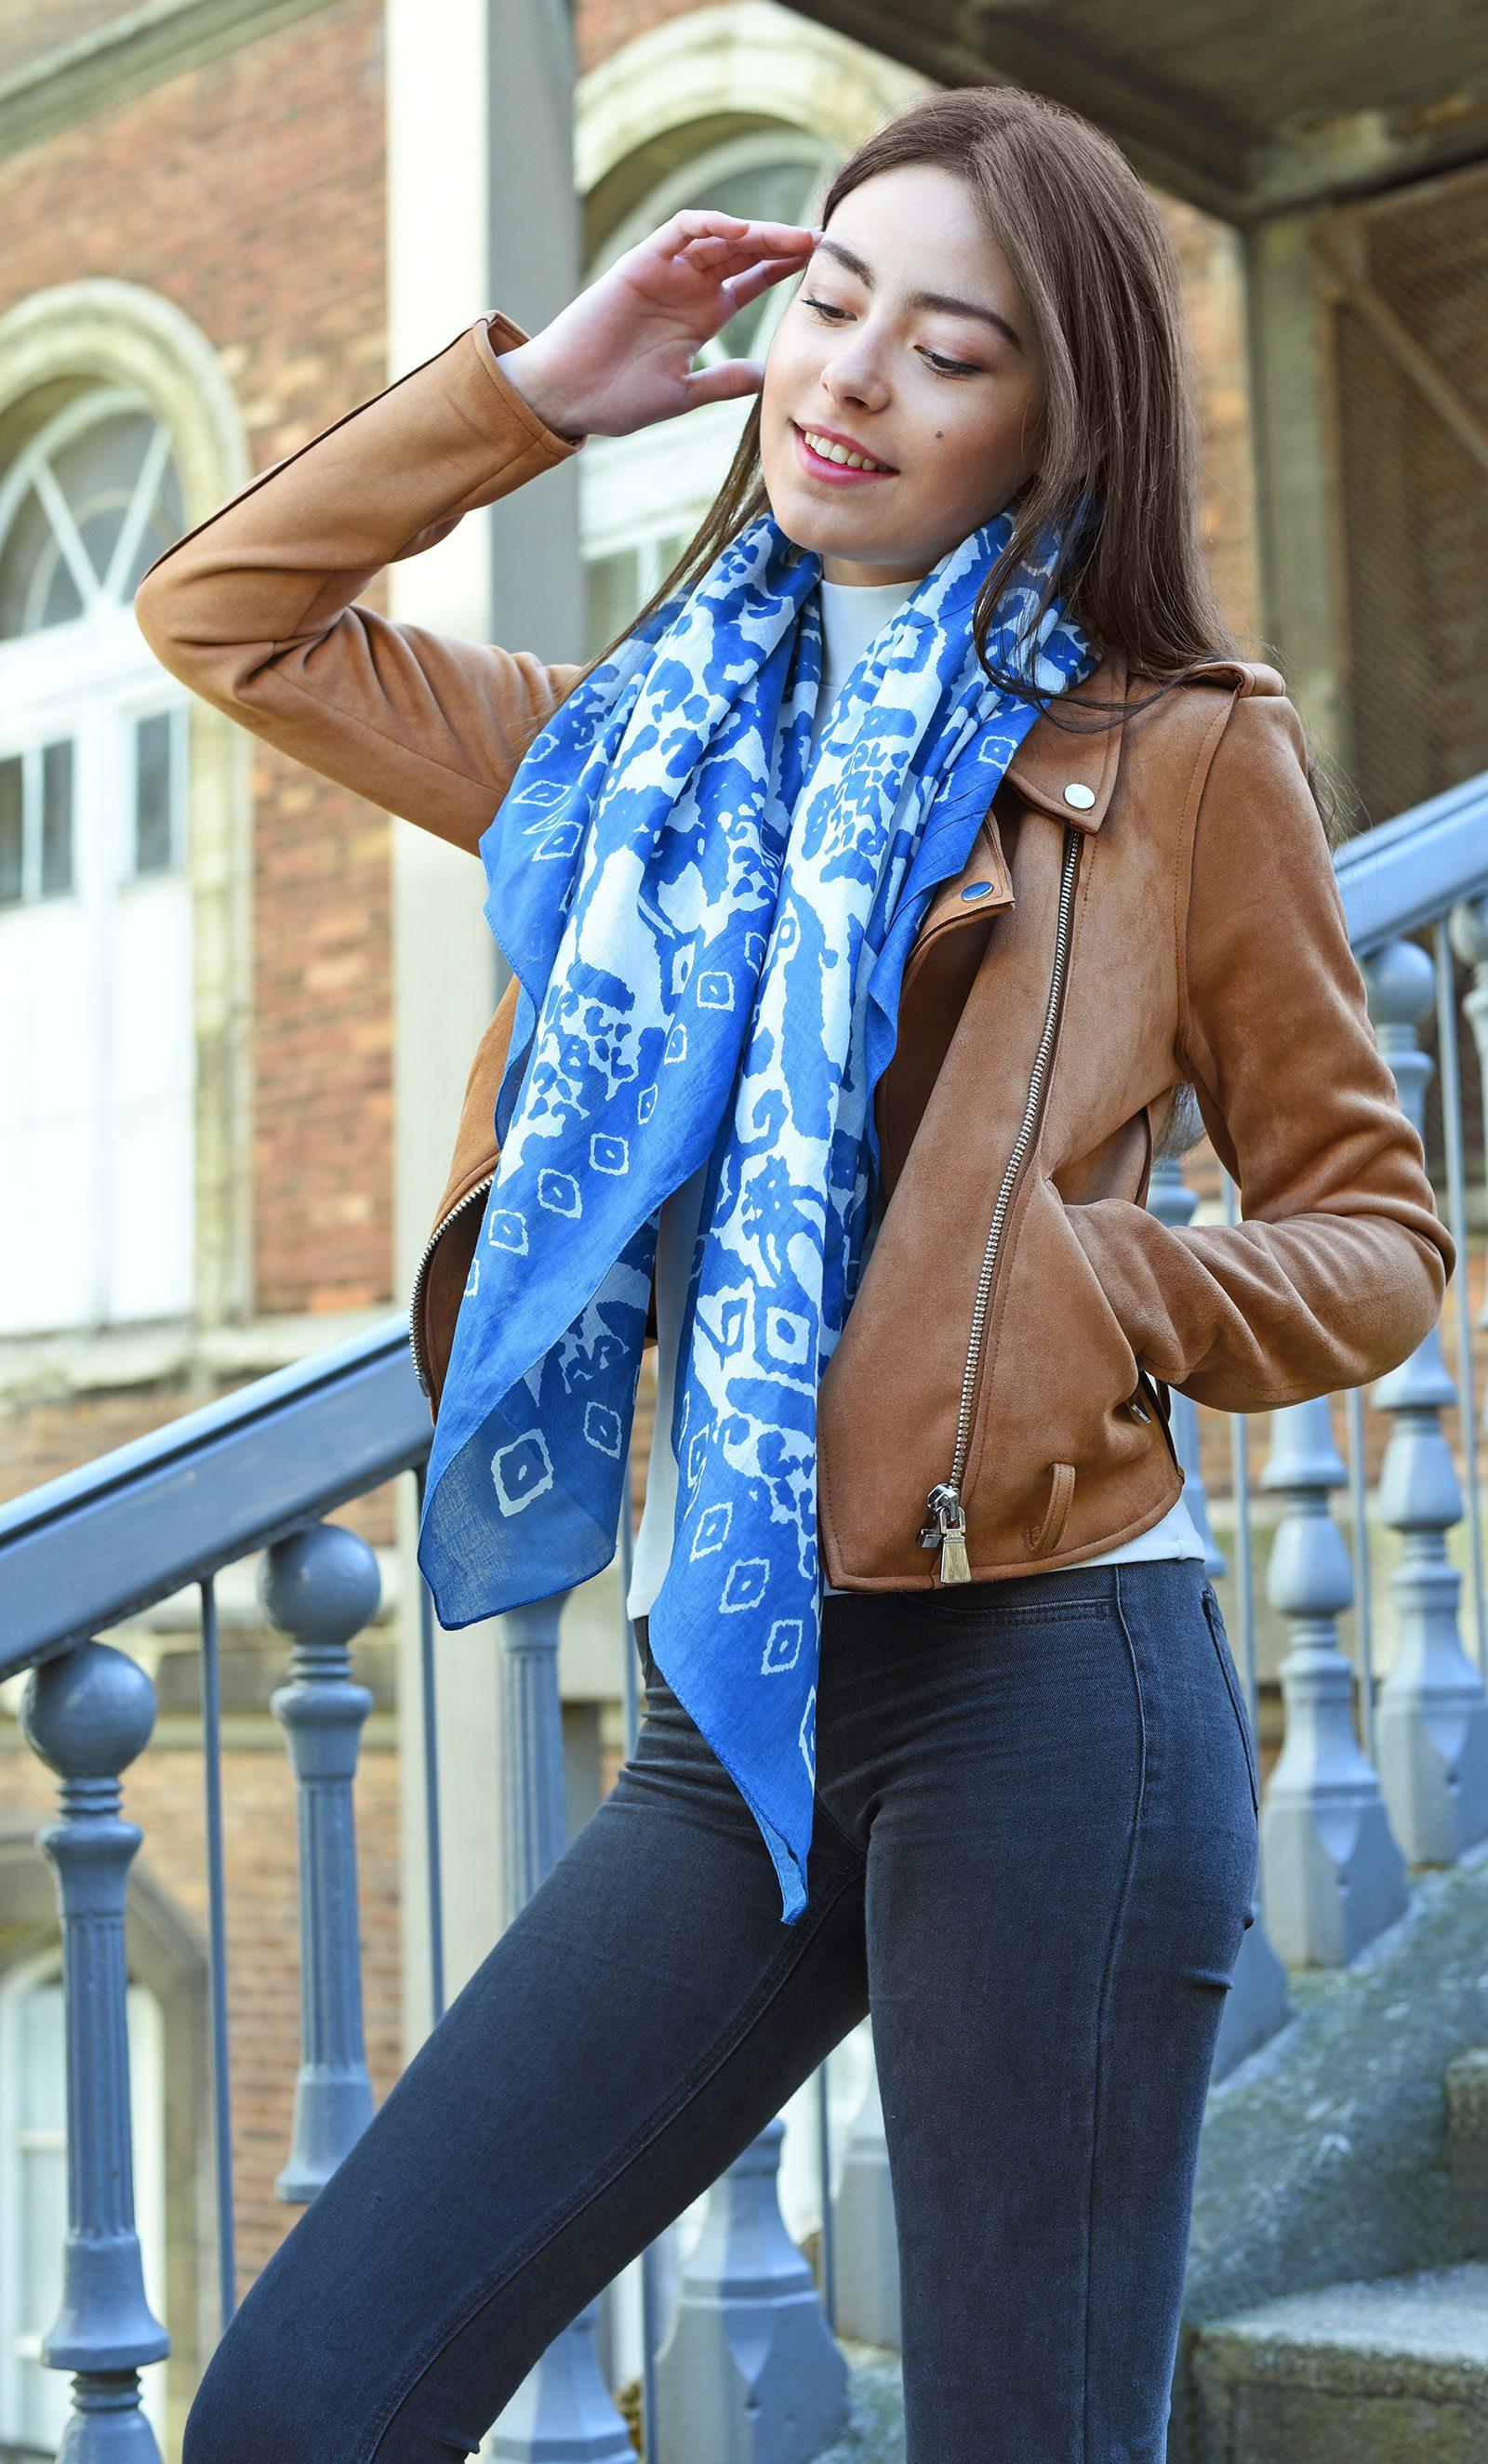 http://lookbook.allee-du-foulard.fr/wp-content/uploads/2018/05/0662-ADF-Accessoires-de-mode-LB-Coll-ethnique-etnia-bleu-1-1600x2650.jpg